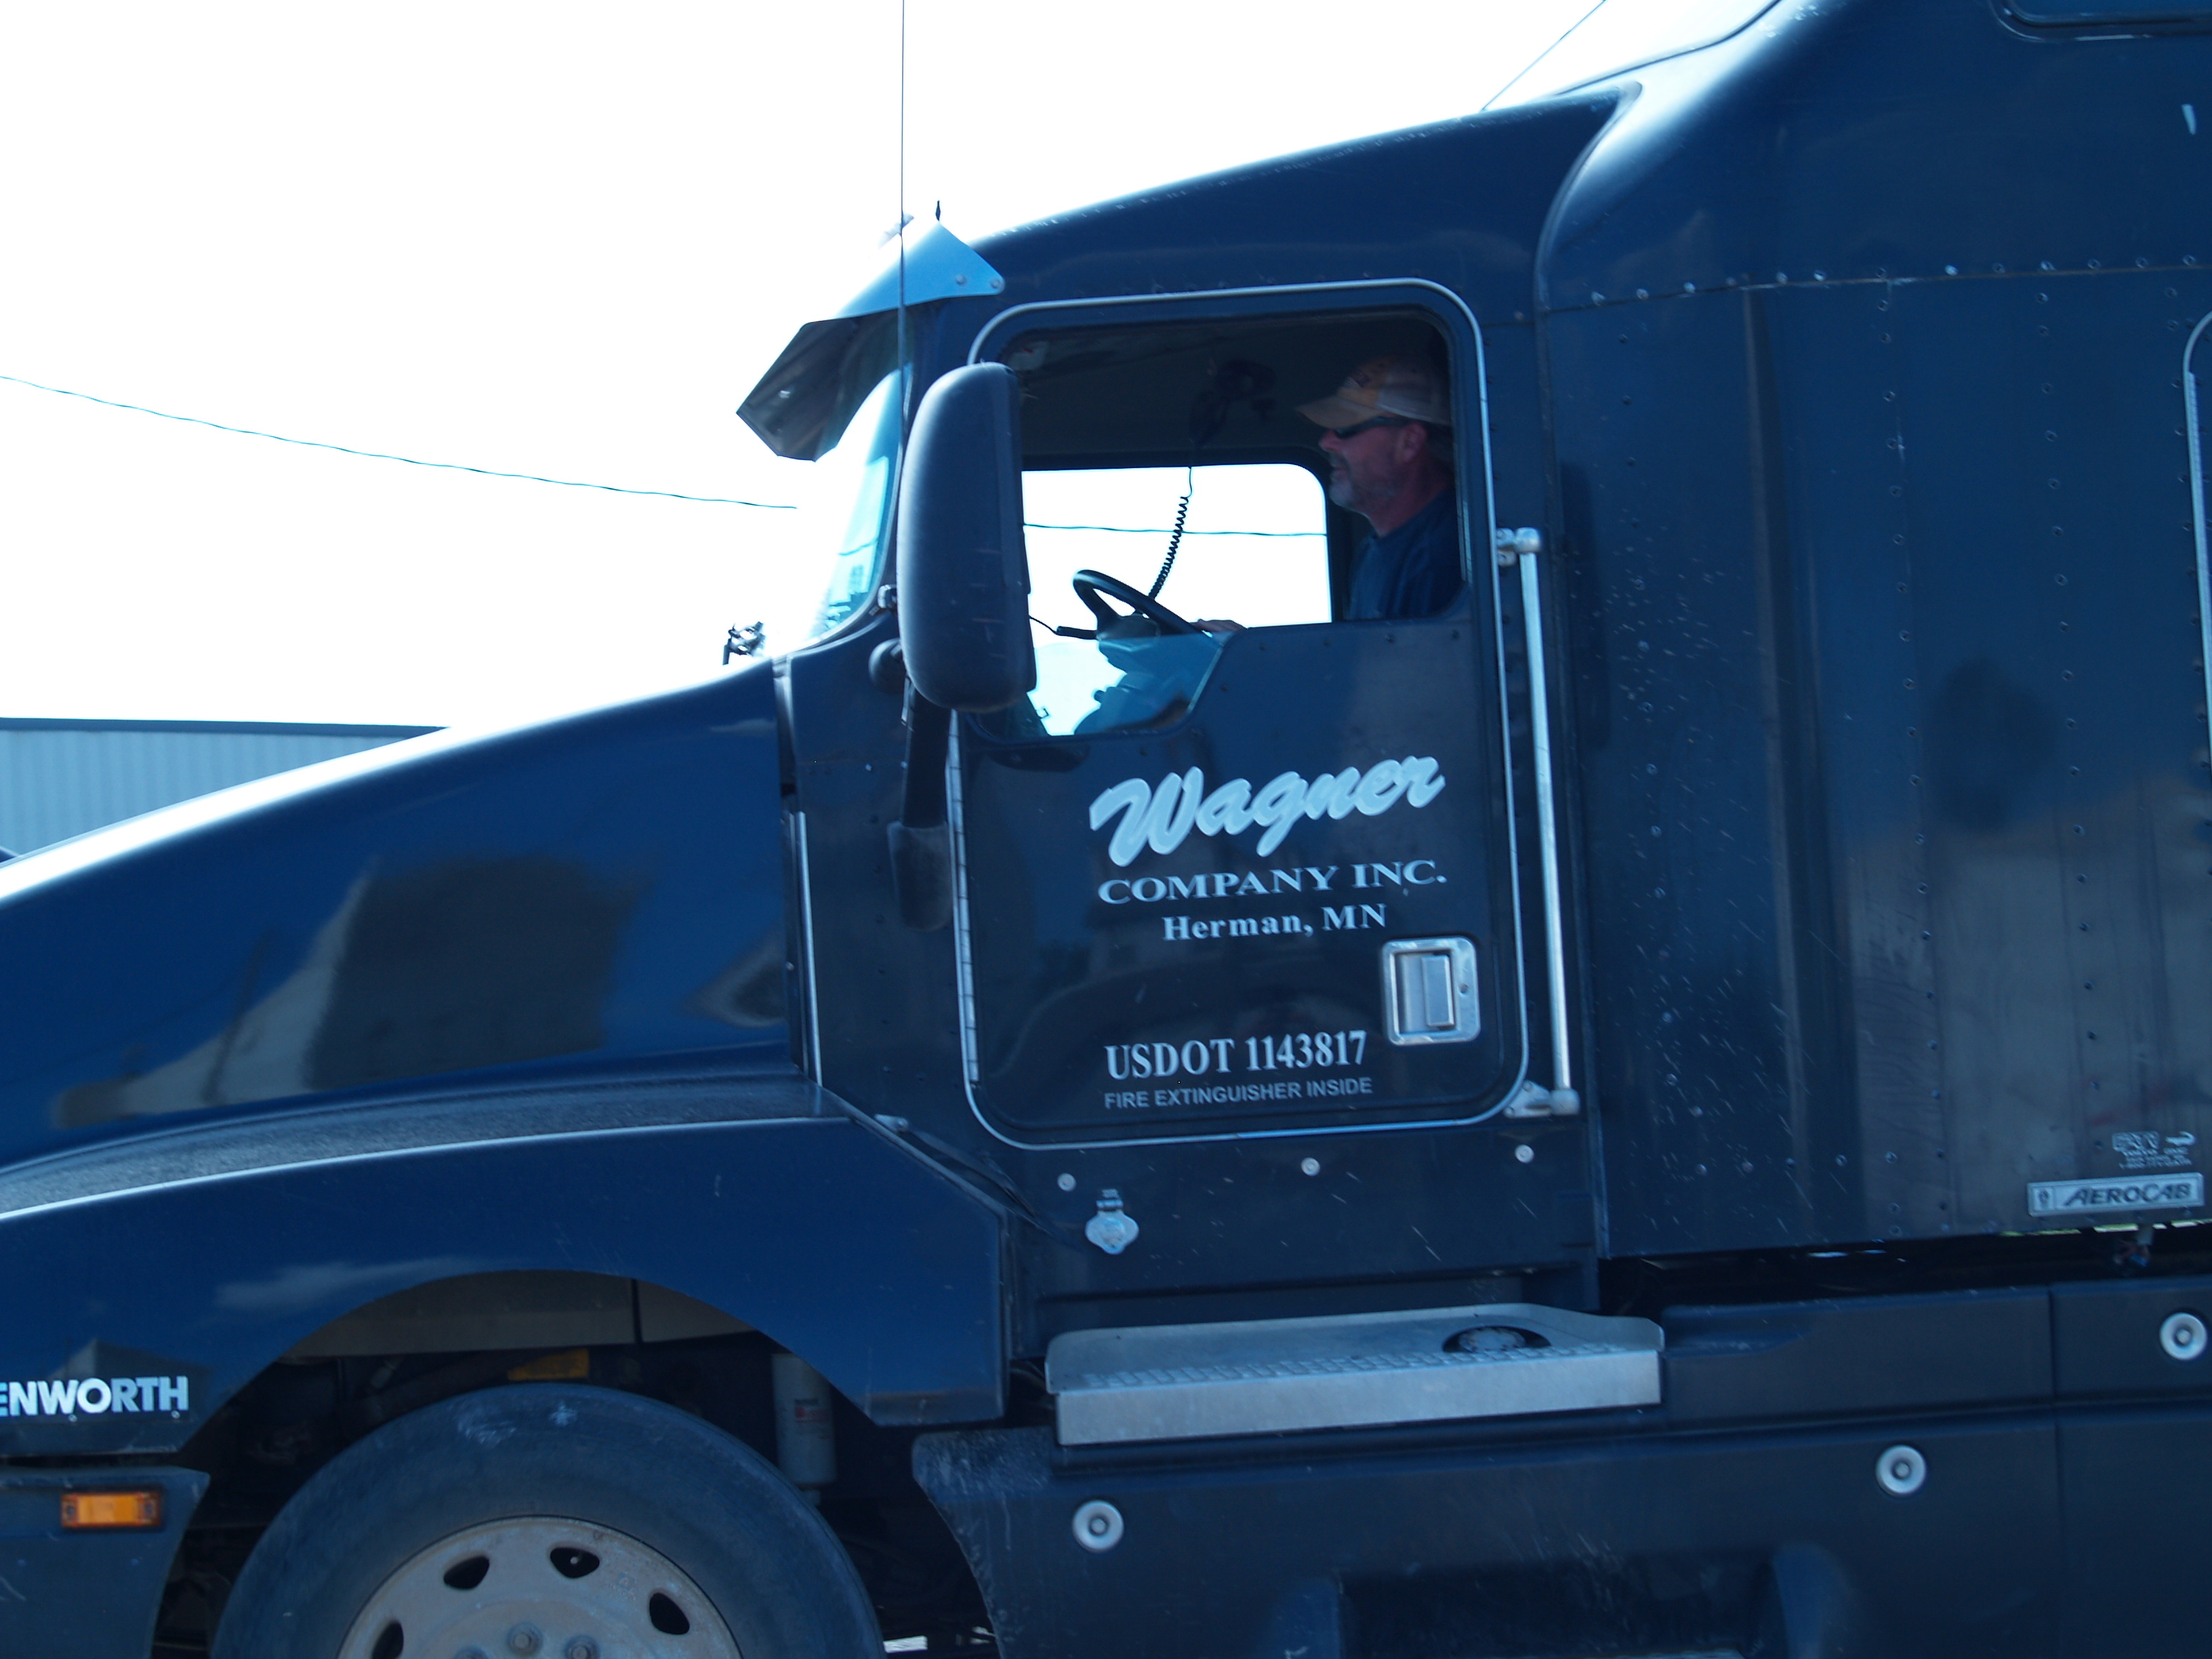 Wagner Company Inc. Herman, MN